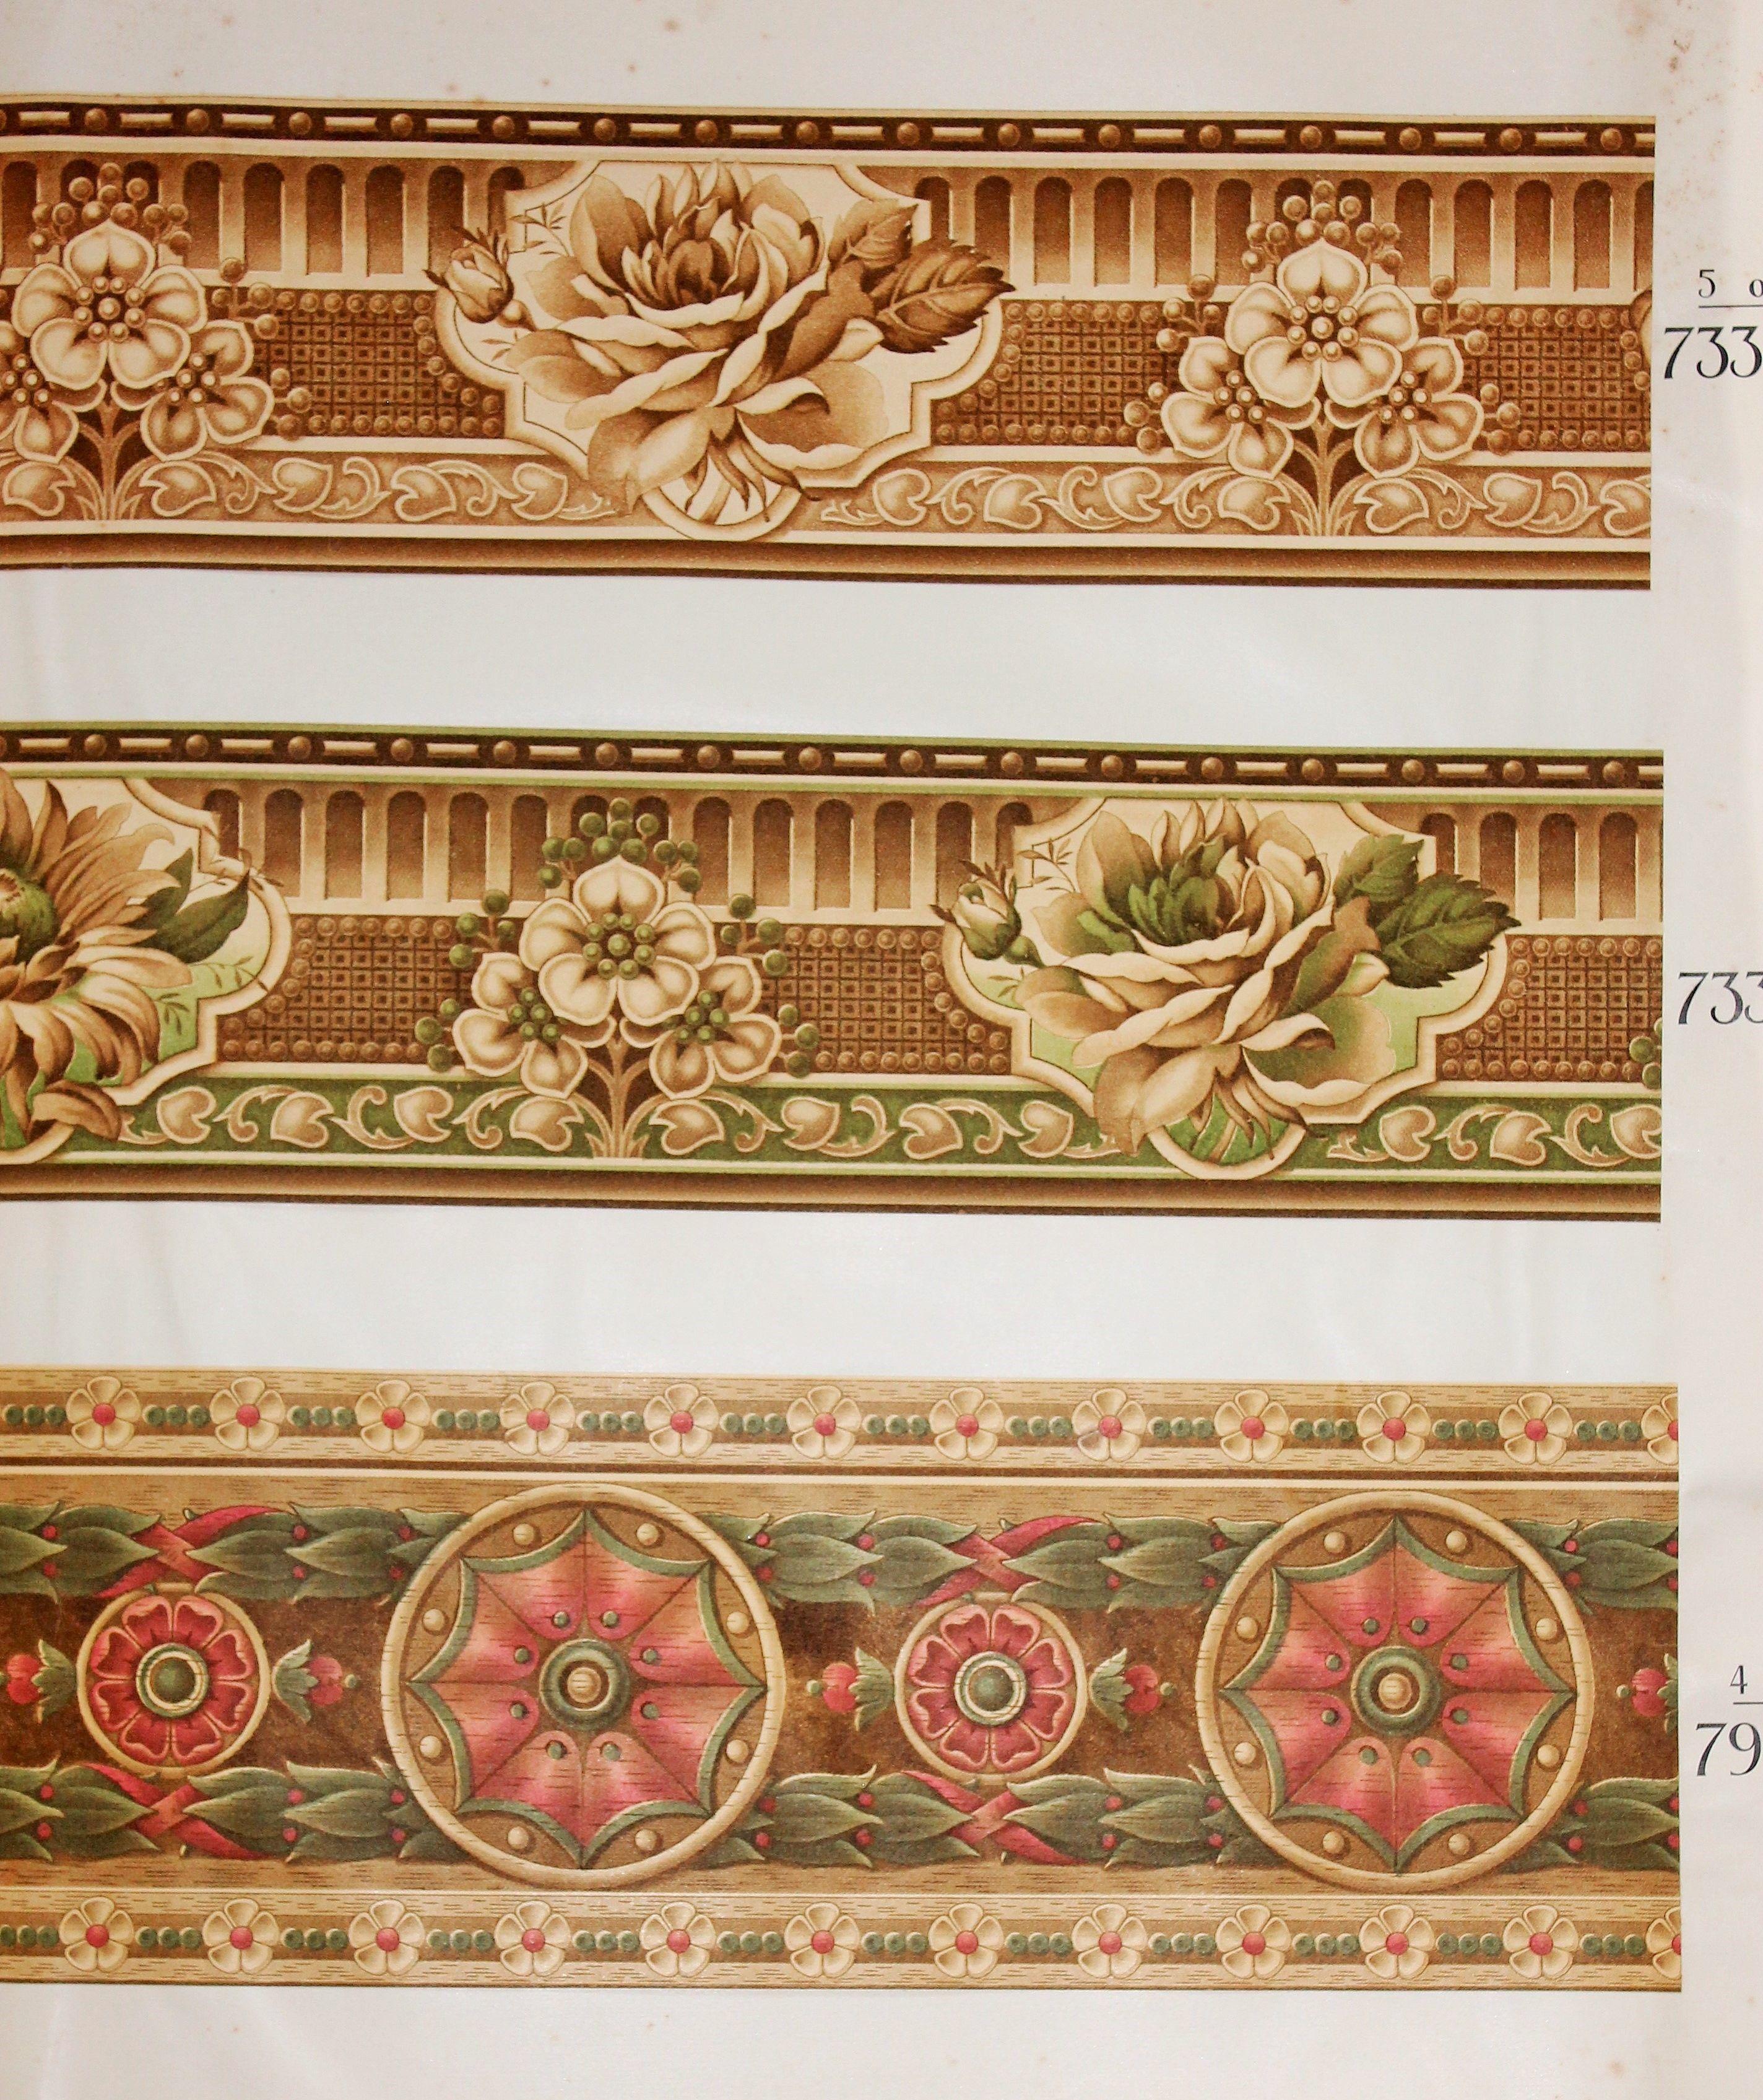 Pin By Abdulazeemkhan On Vintage Wallpaper Borders Digital Borders Design Border Design Digital Borders